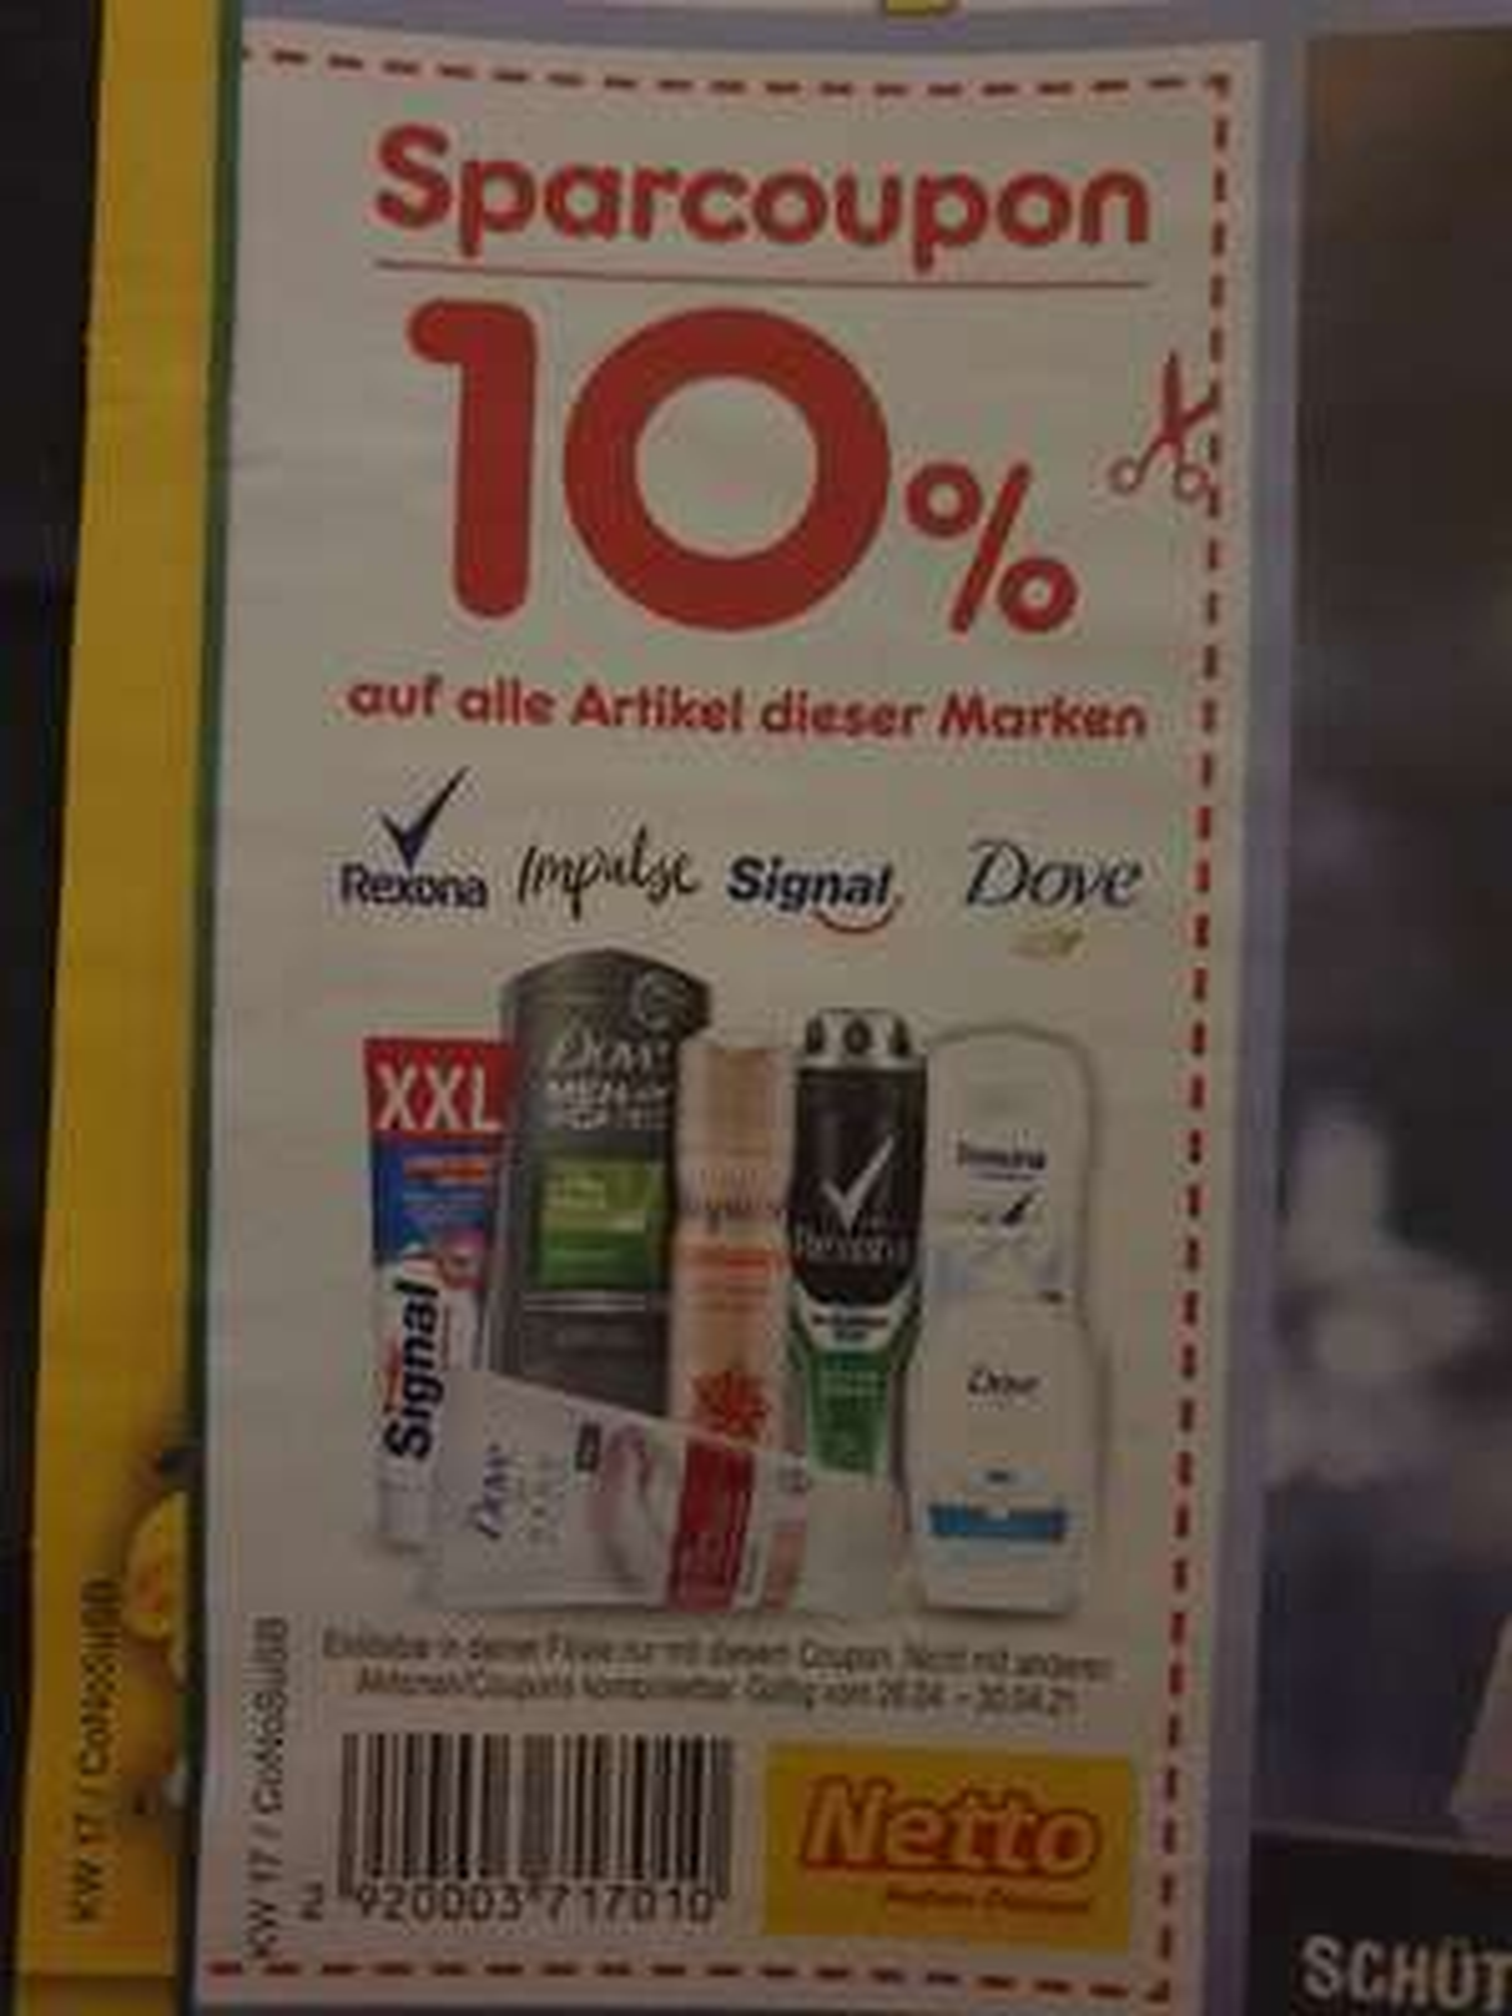 (Netto) 10% auf Rexona, Impulse, Signal, Dove